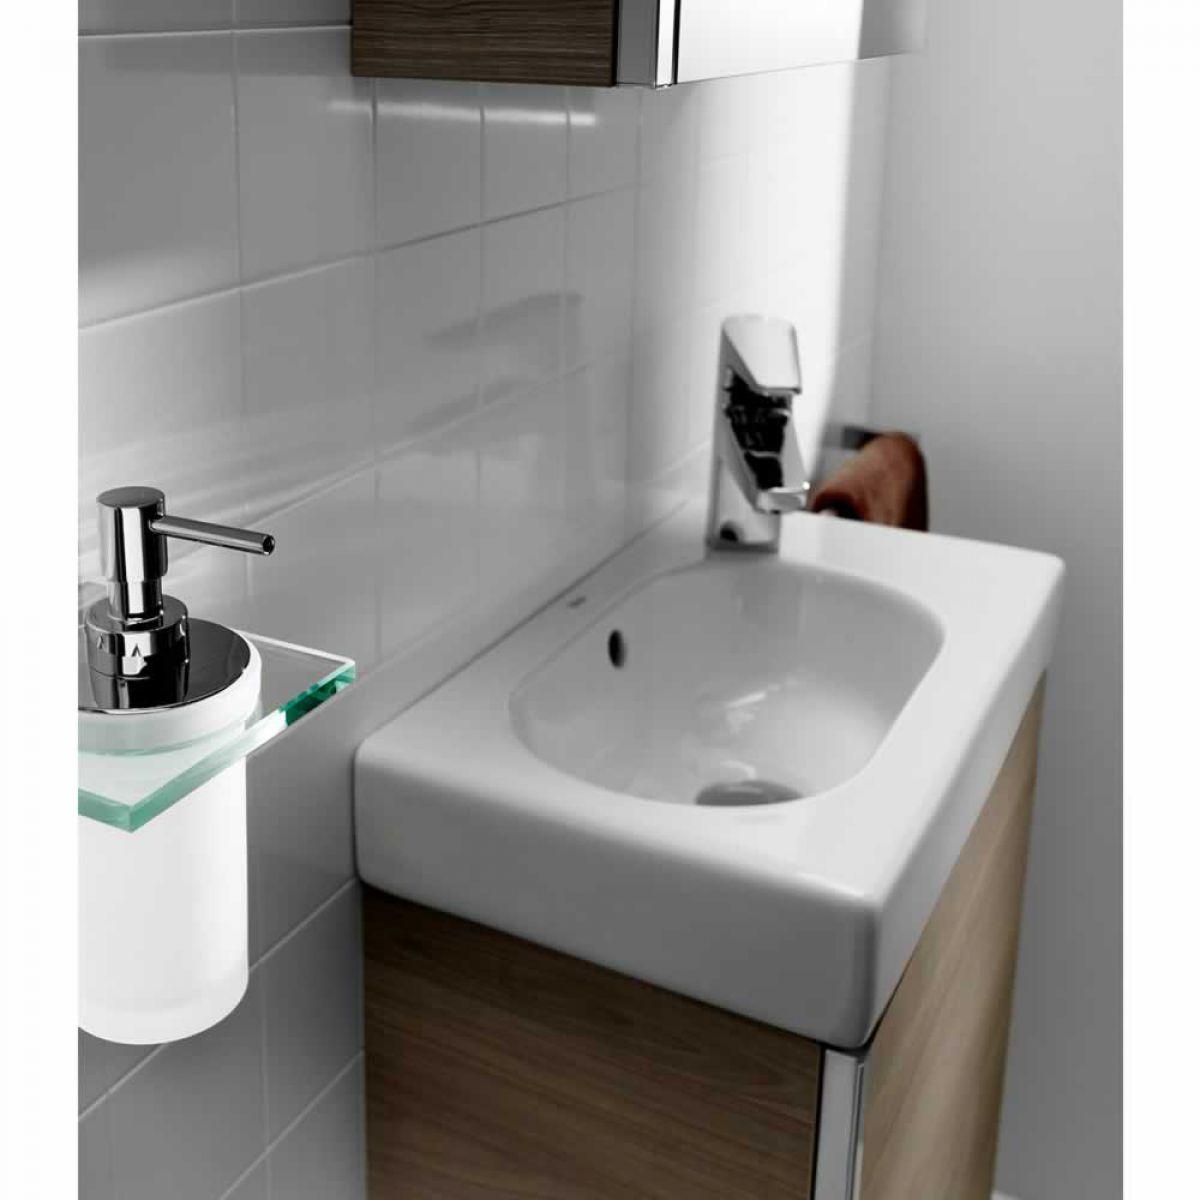 Roca mini vanity unit with basin uk bathrooms for Roca bathroom fittings